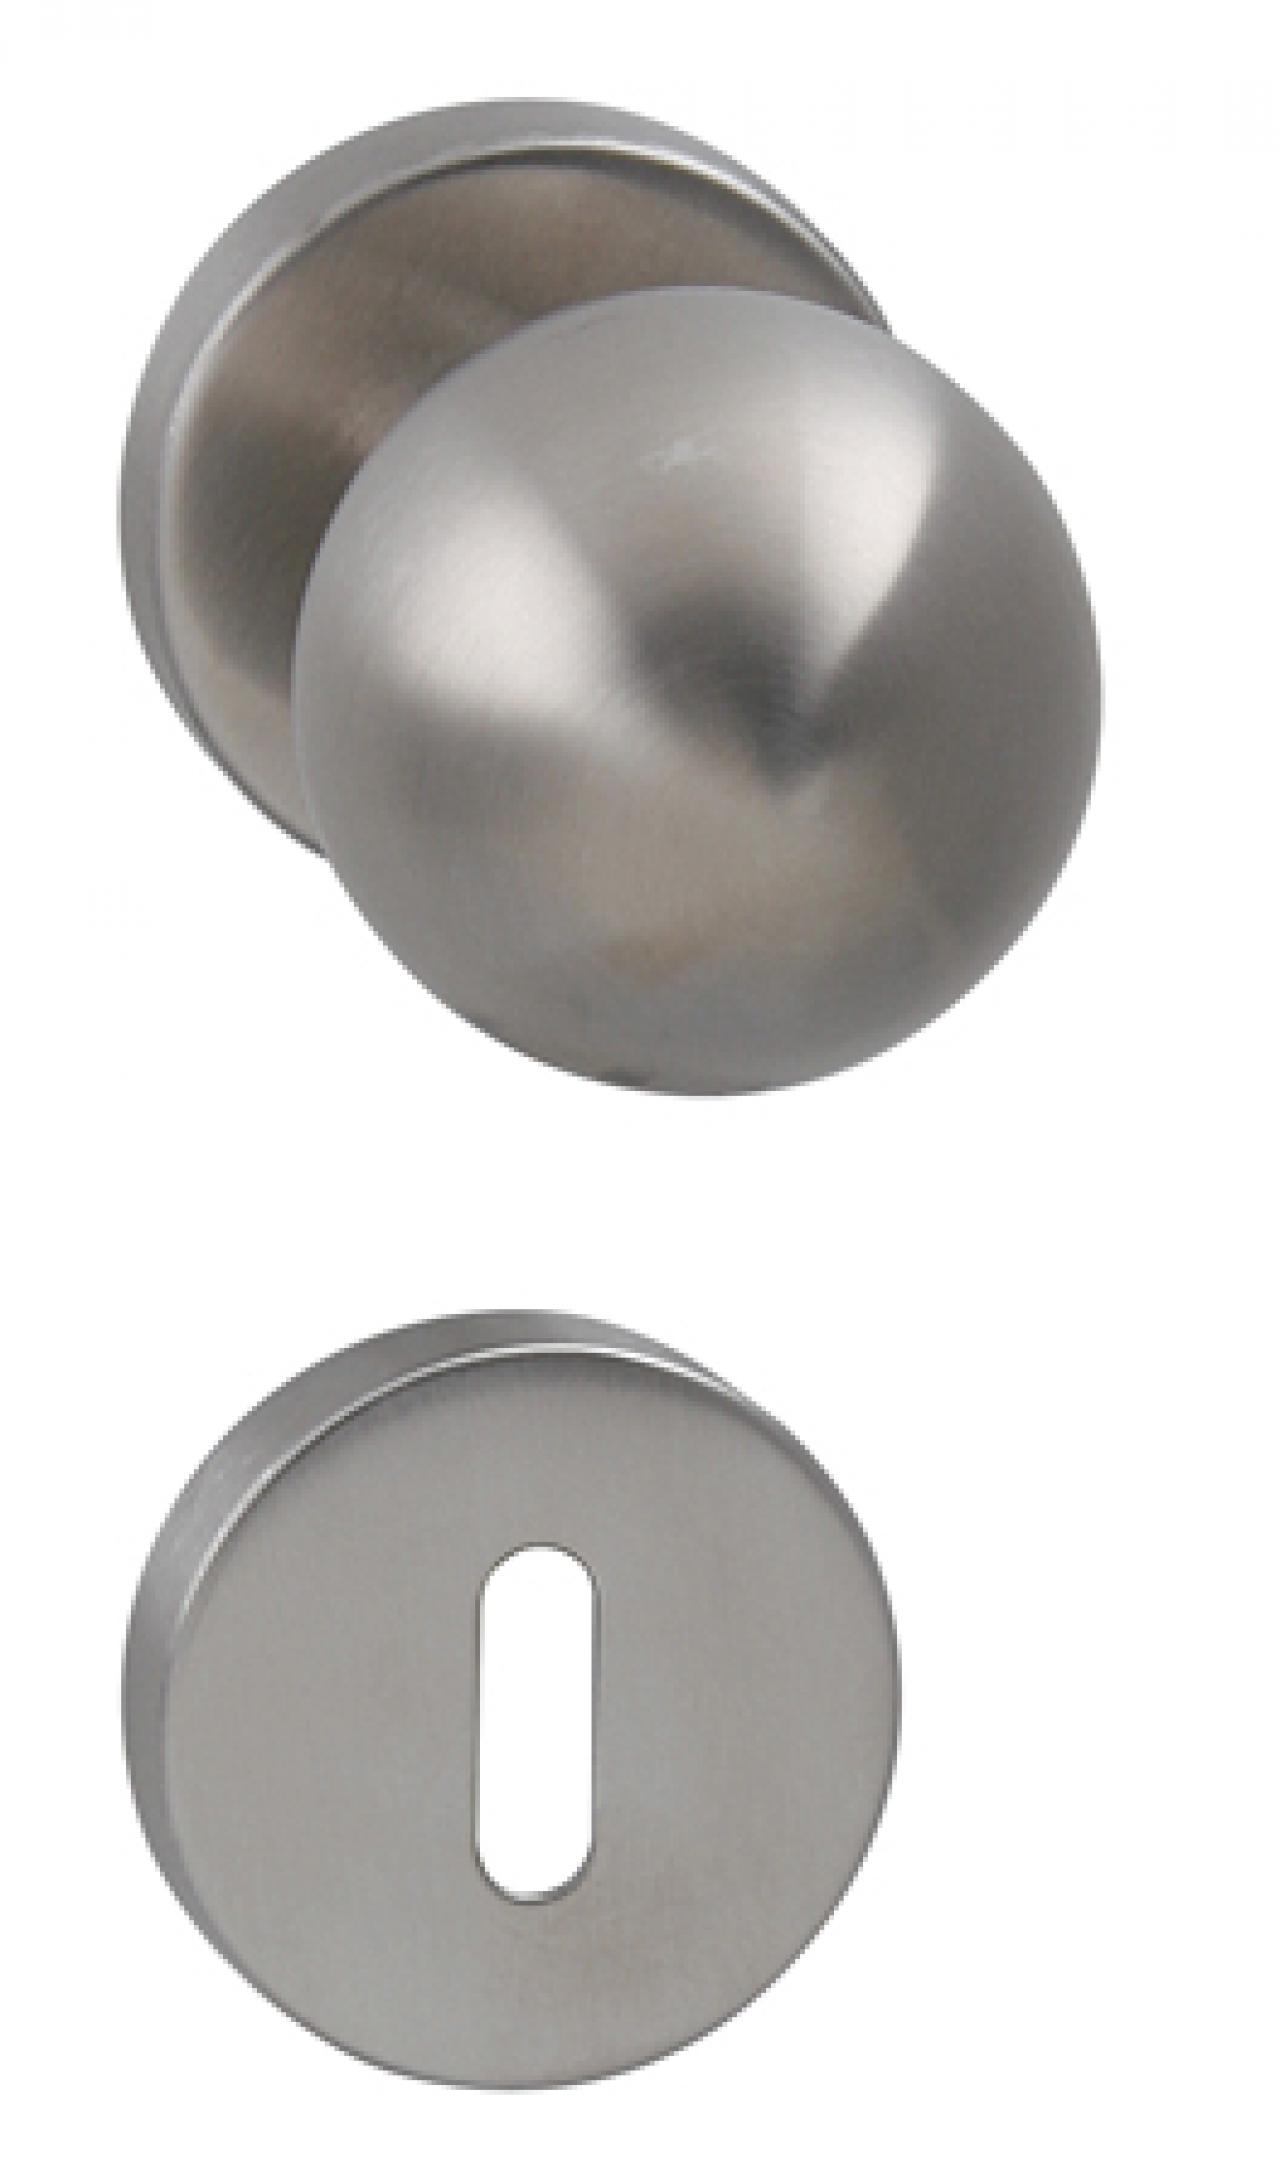 Gomb 326 inox fix gomb - Maestro